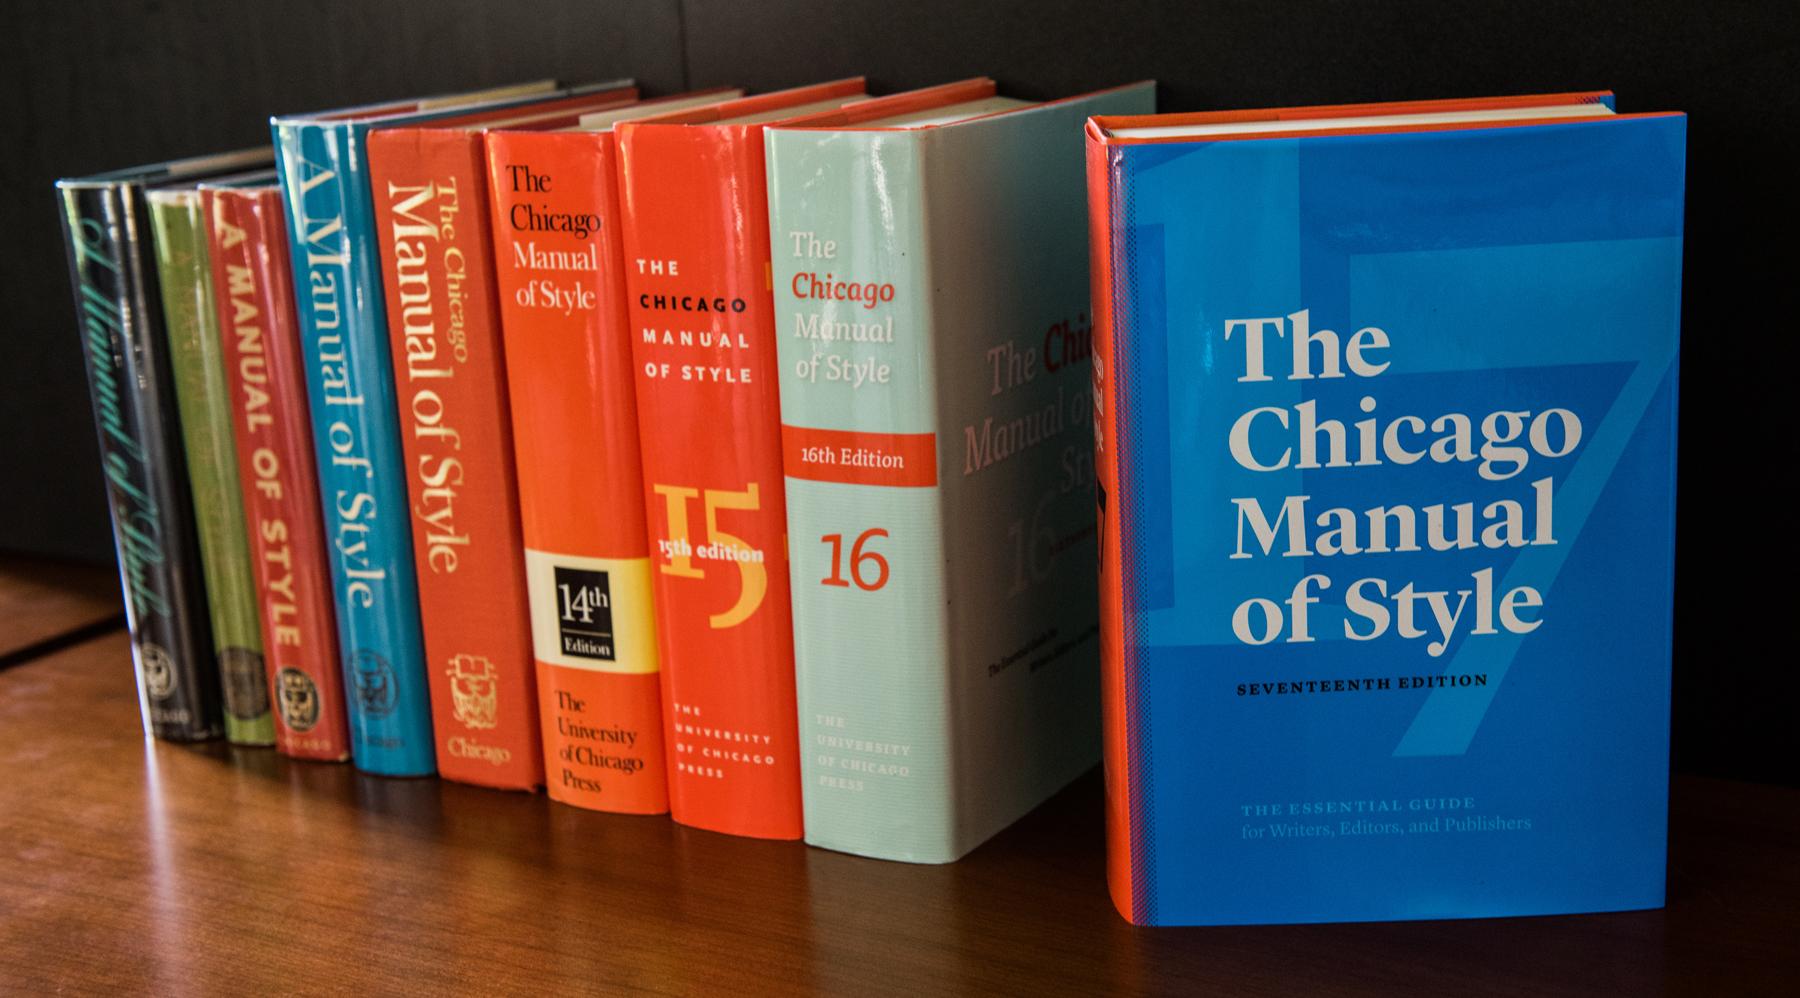 apa publication manual 6th edition pdf download